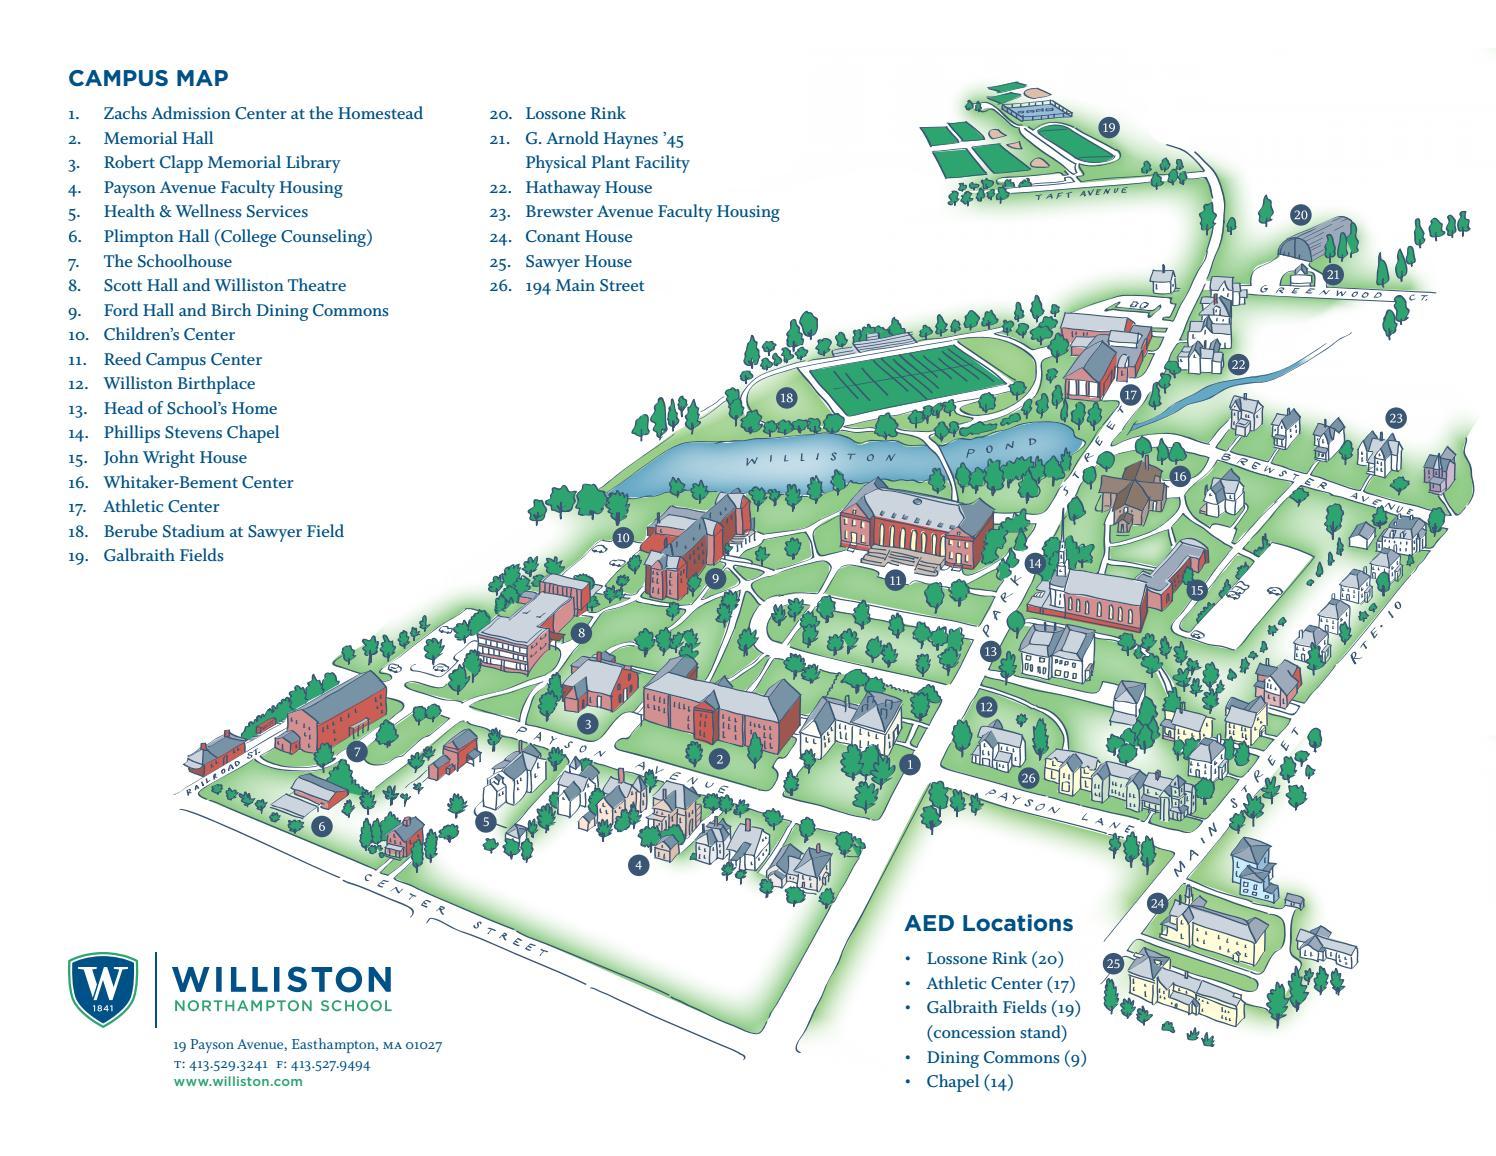 the williston northampton school campus map by williston northampton school issuu. the williston northampton school campus map by williston